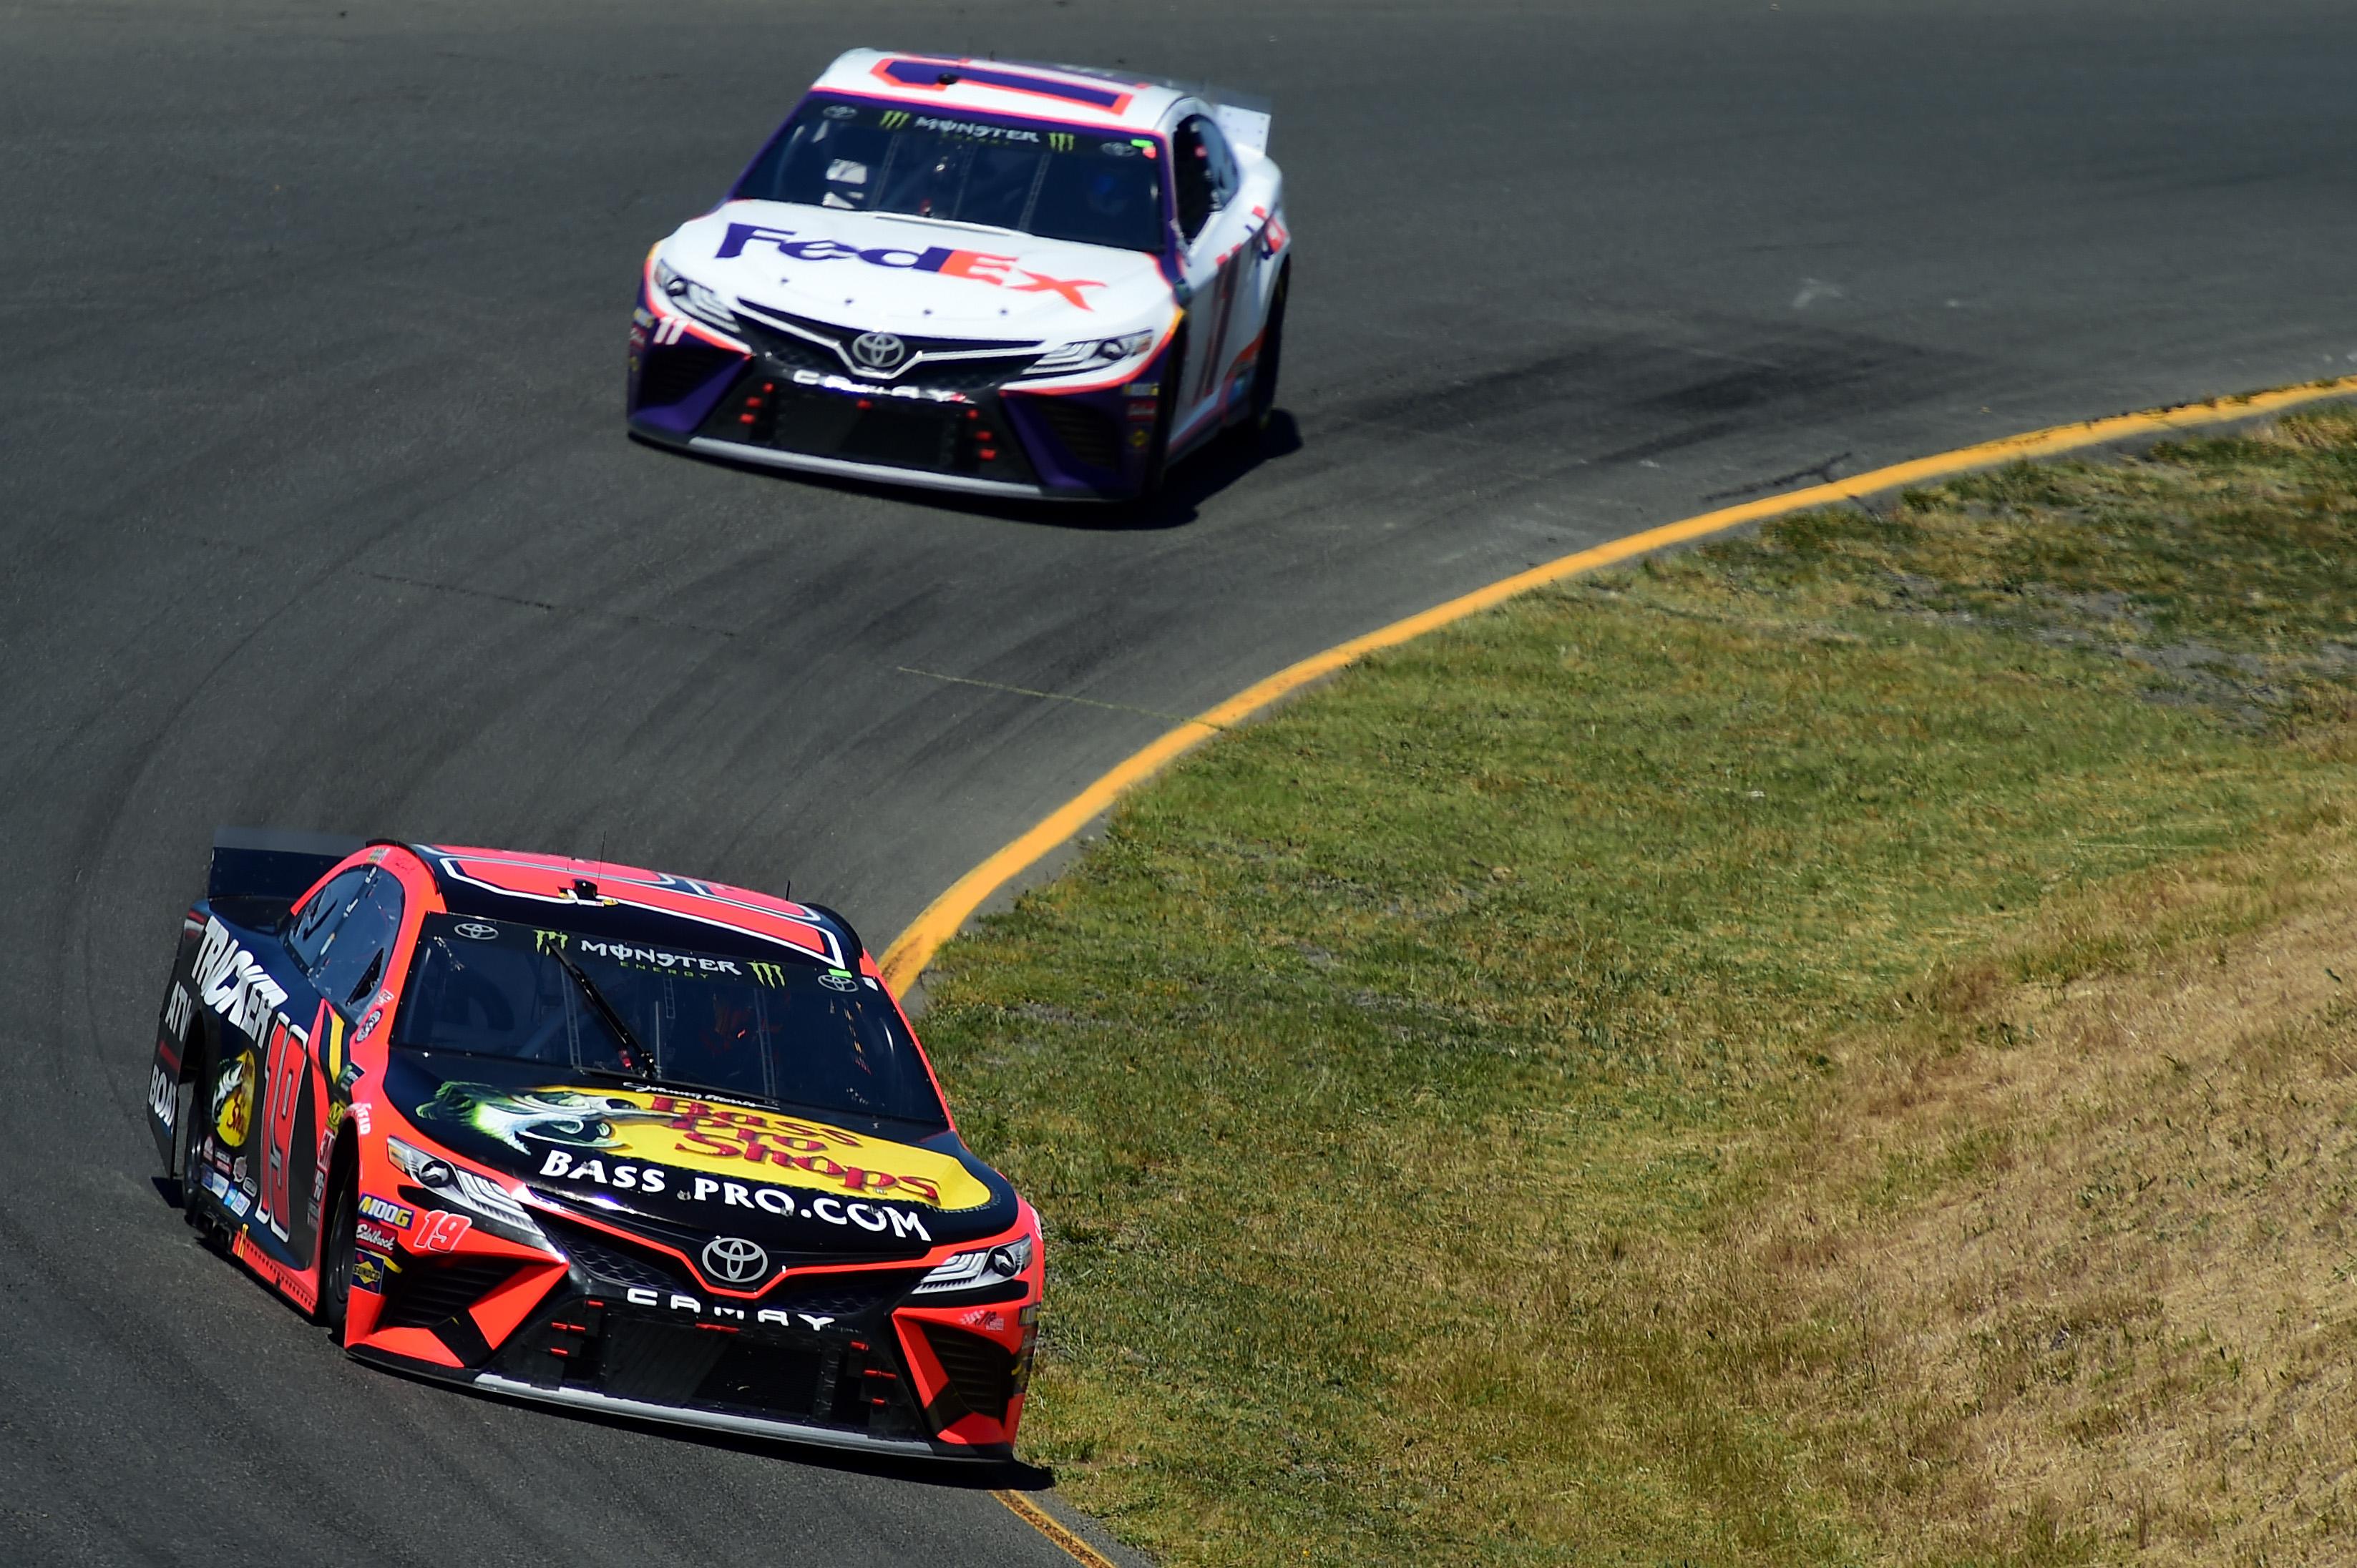 Martin Truex Jr and Denny Hamlin at Sonoma Raceway - NASCAR